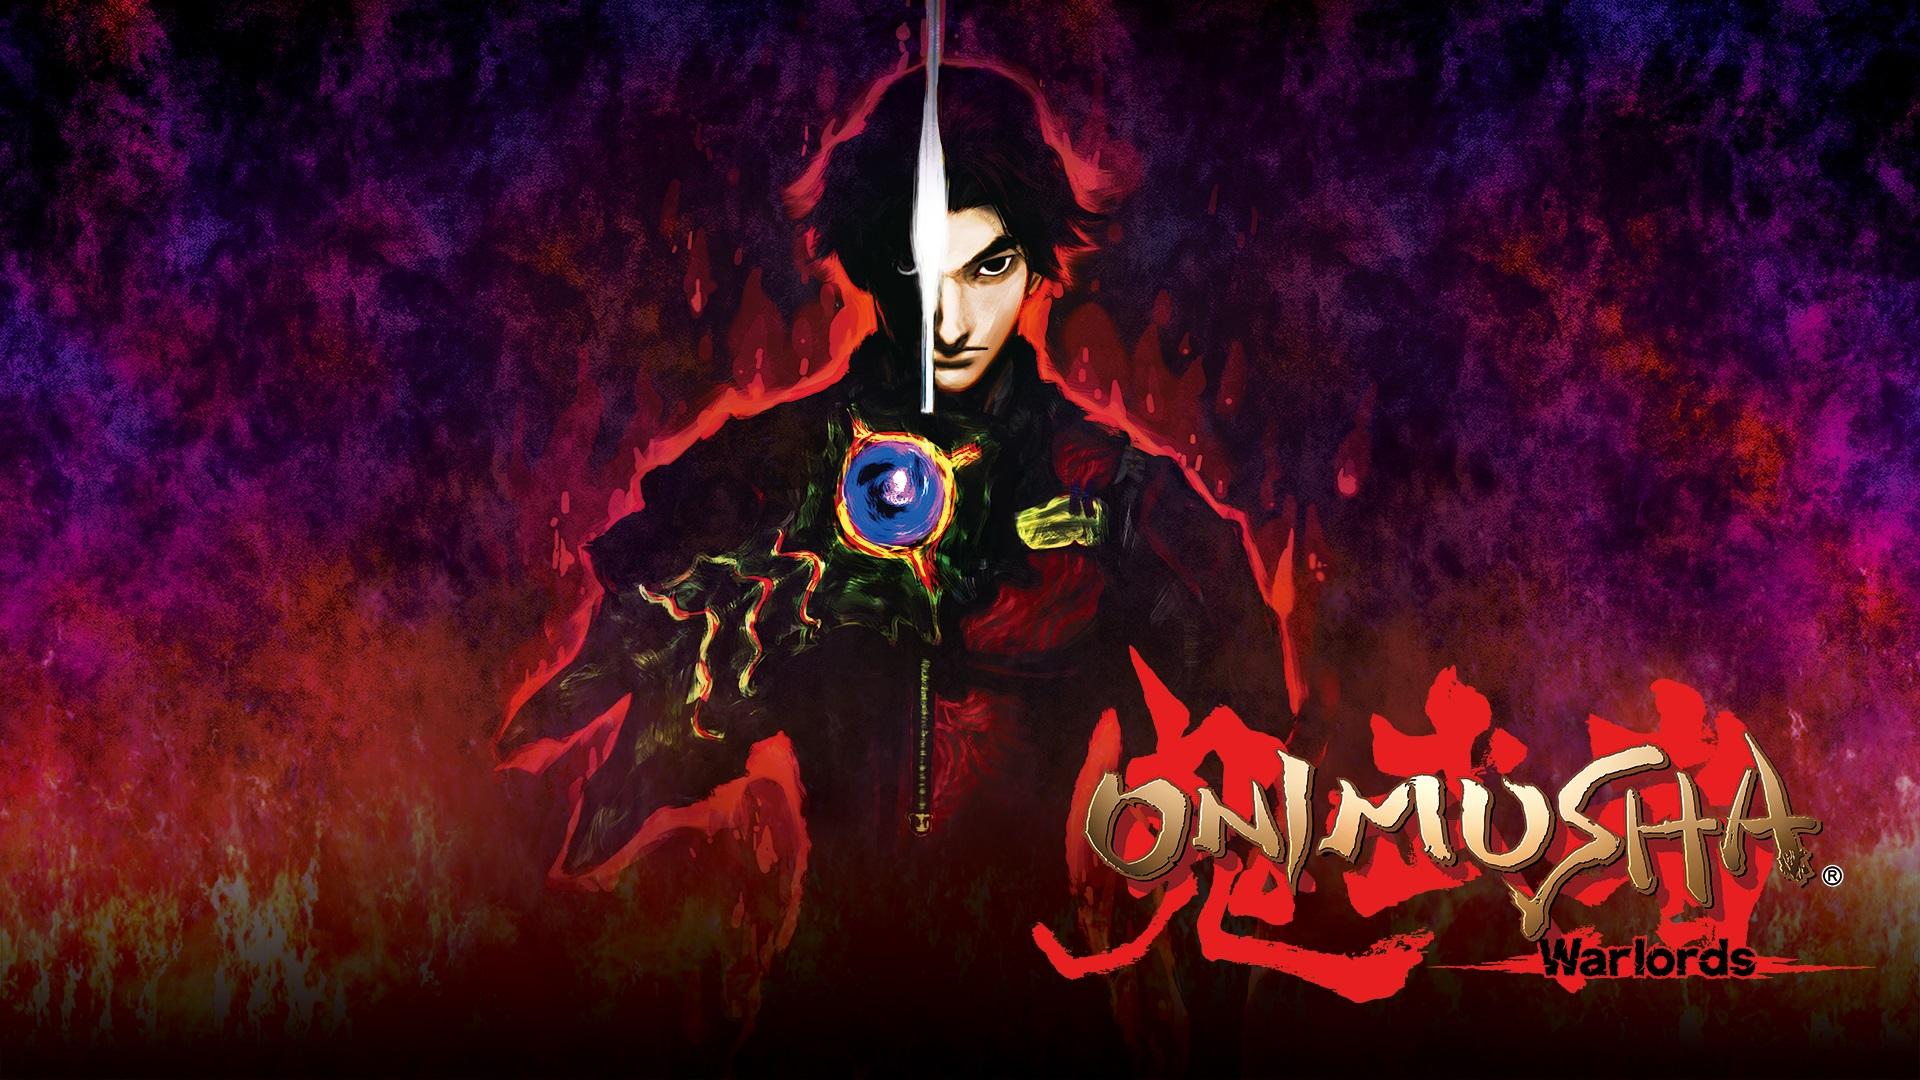 Onimusha: Warlords chegando ao PC, PS4, Xbox One e Switch ...